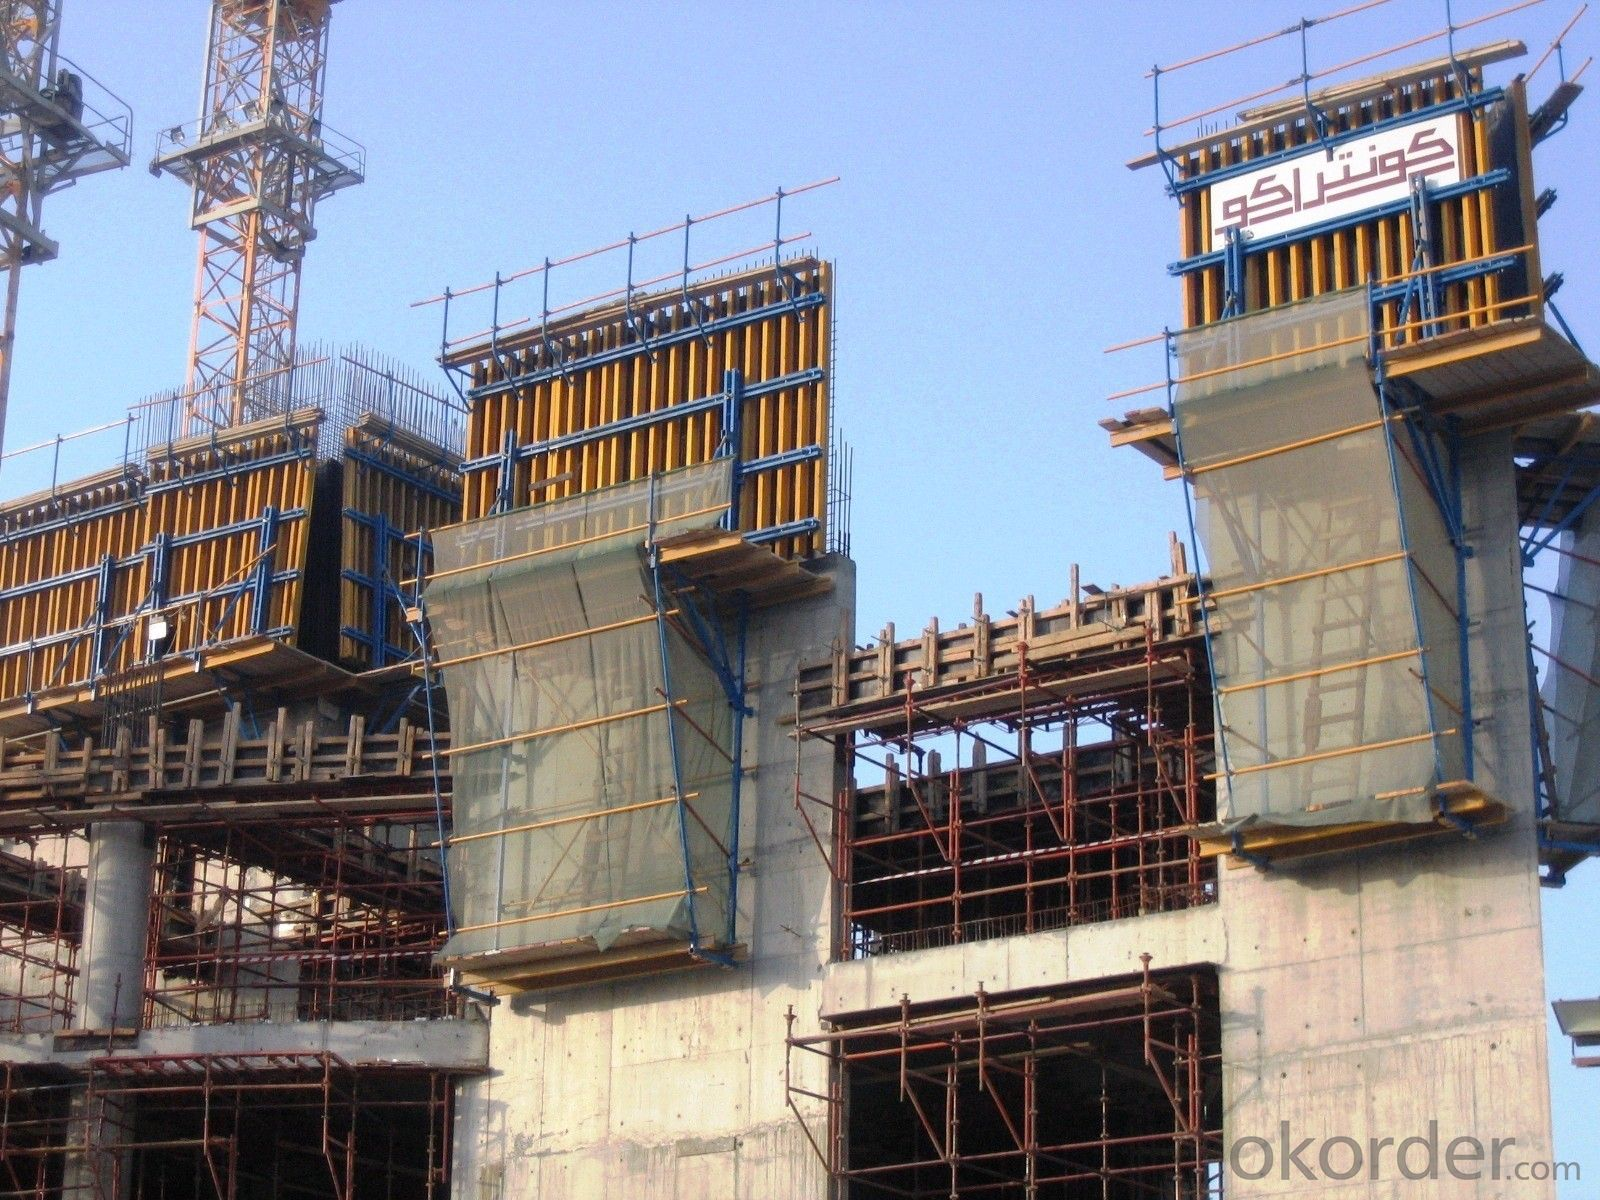 Economic Climbing Formwork System CB210 with Adjustable Brace